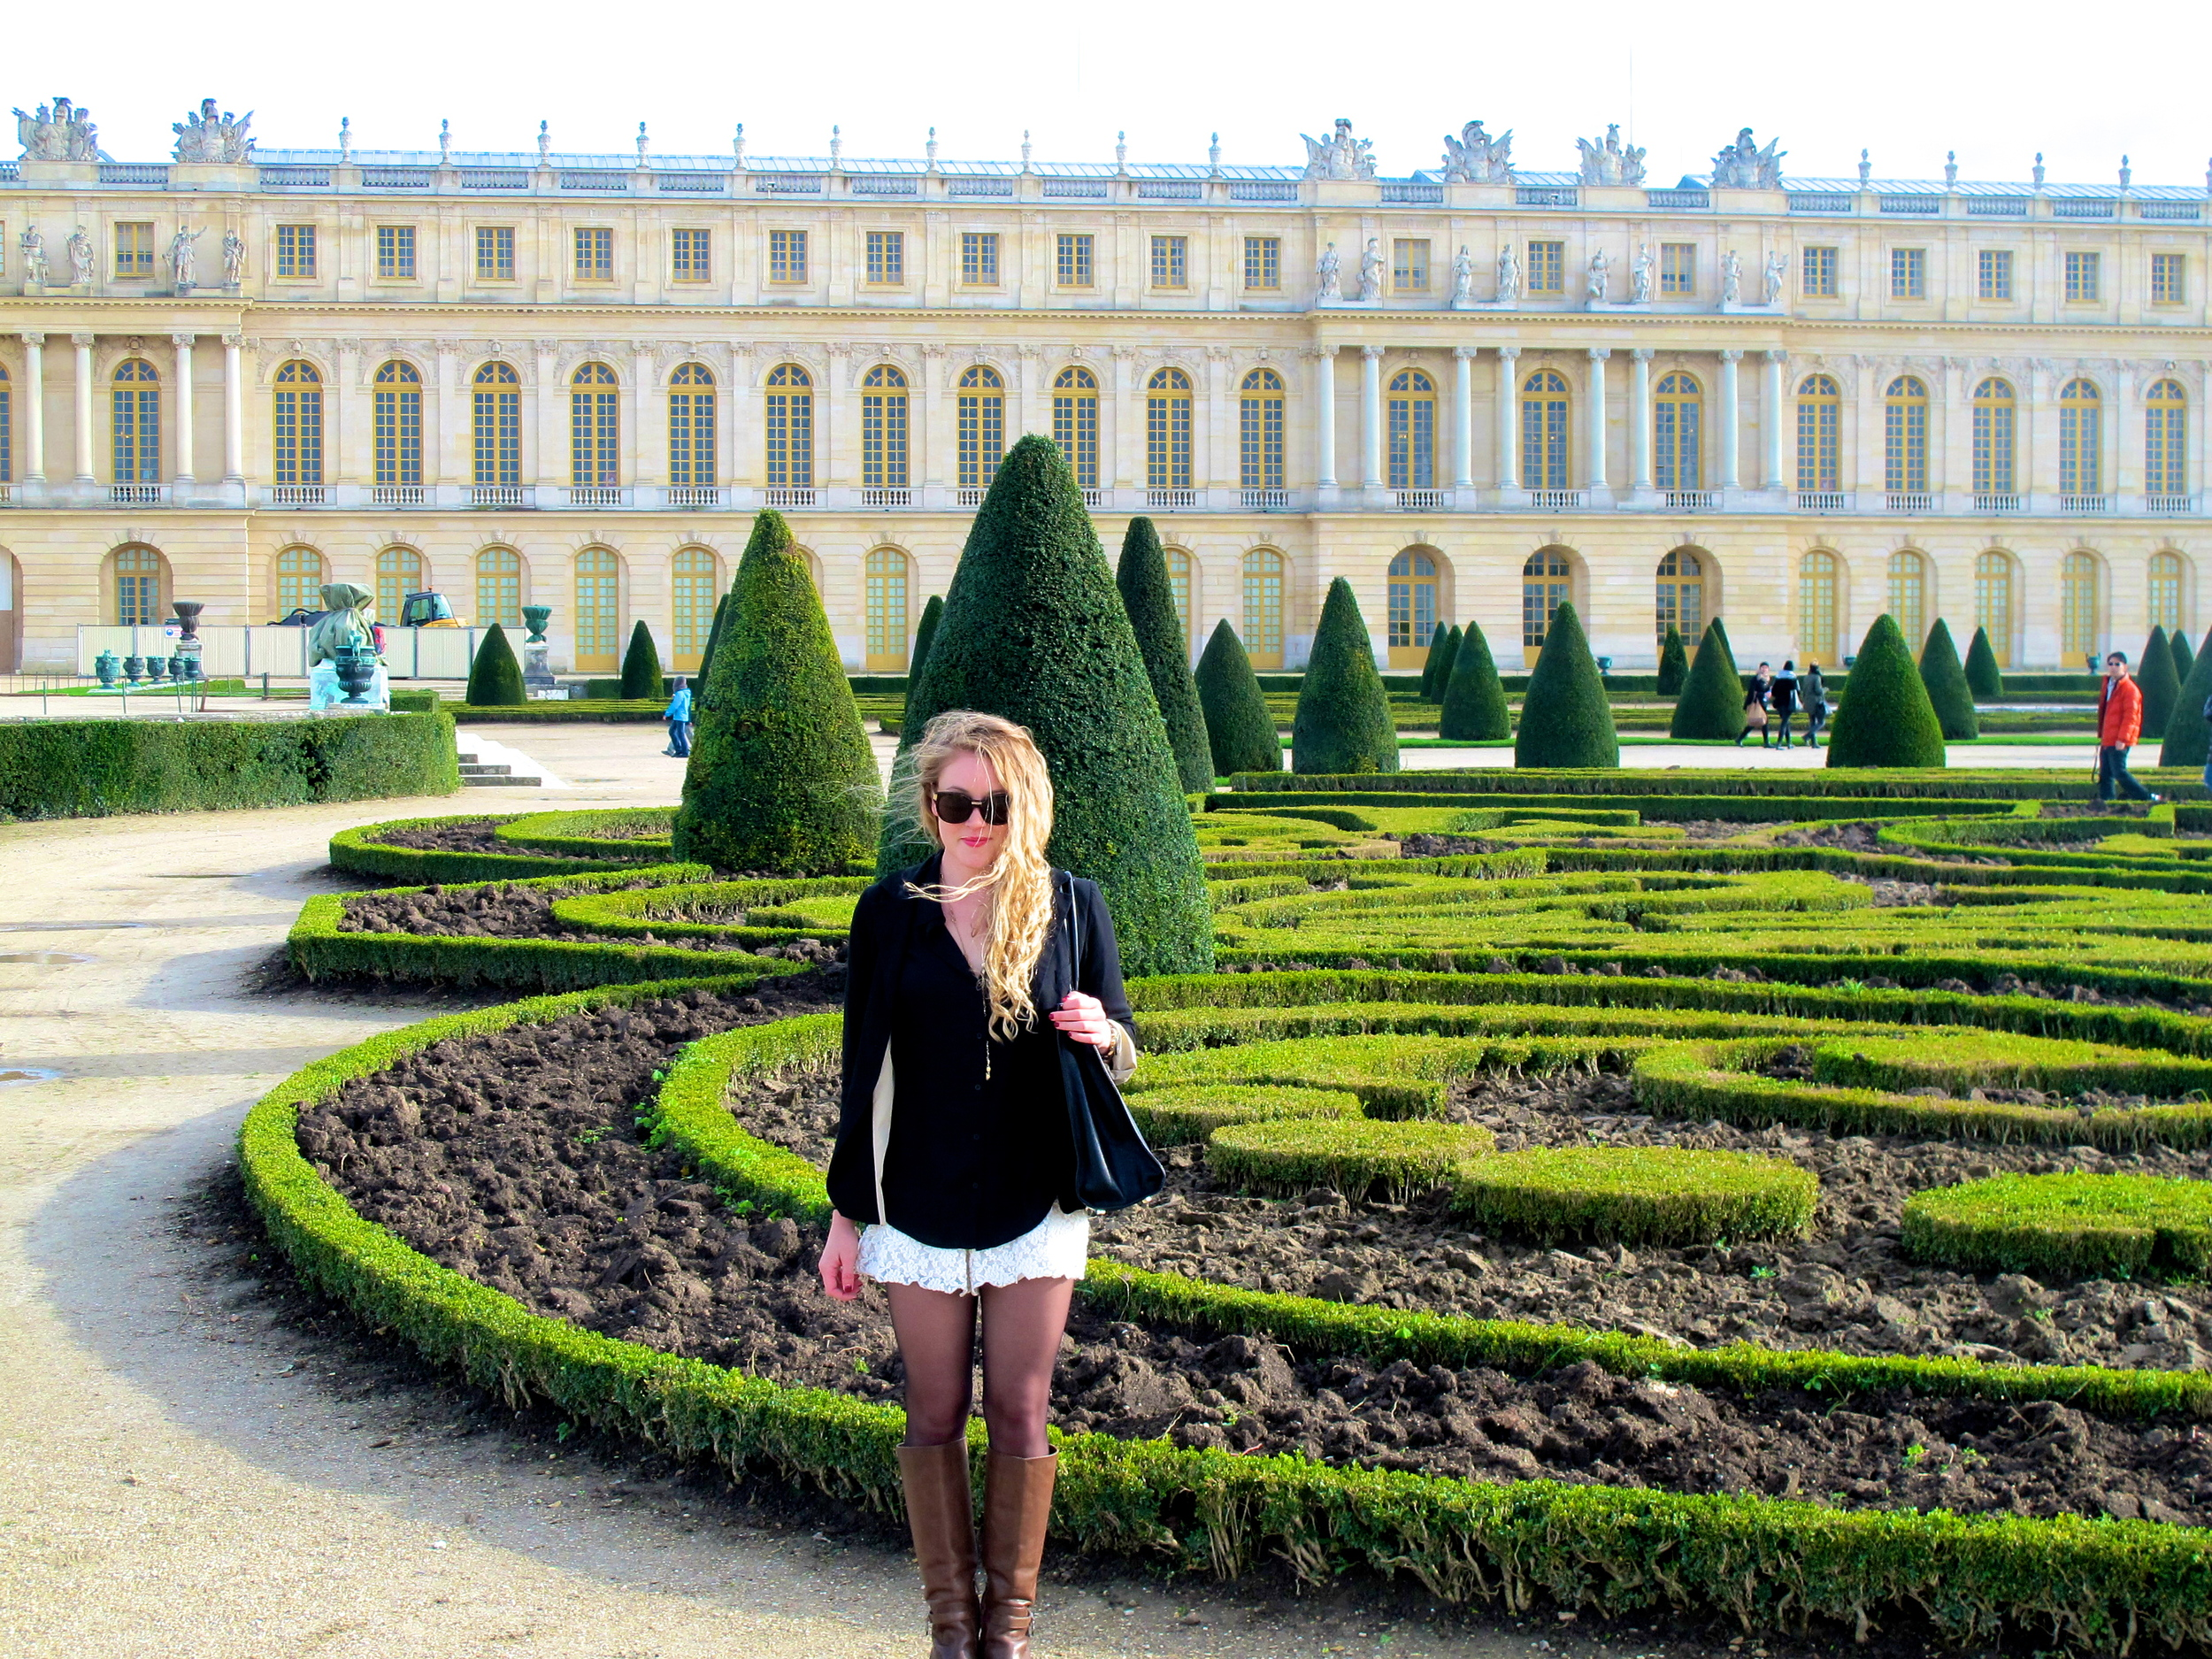 VersaillesGarden2.JPG